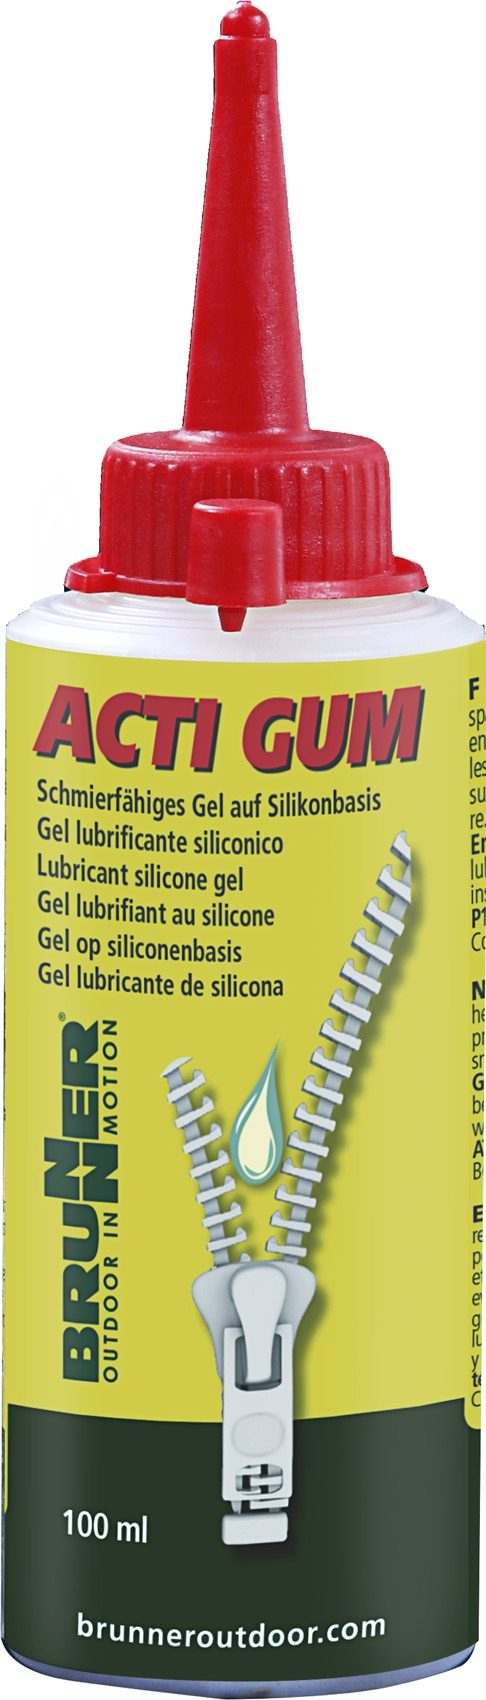 Gel lubrificante Acti-Gum 100ml